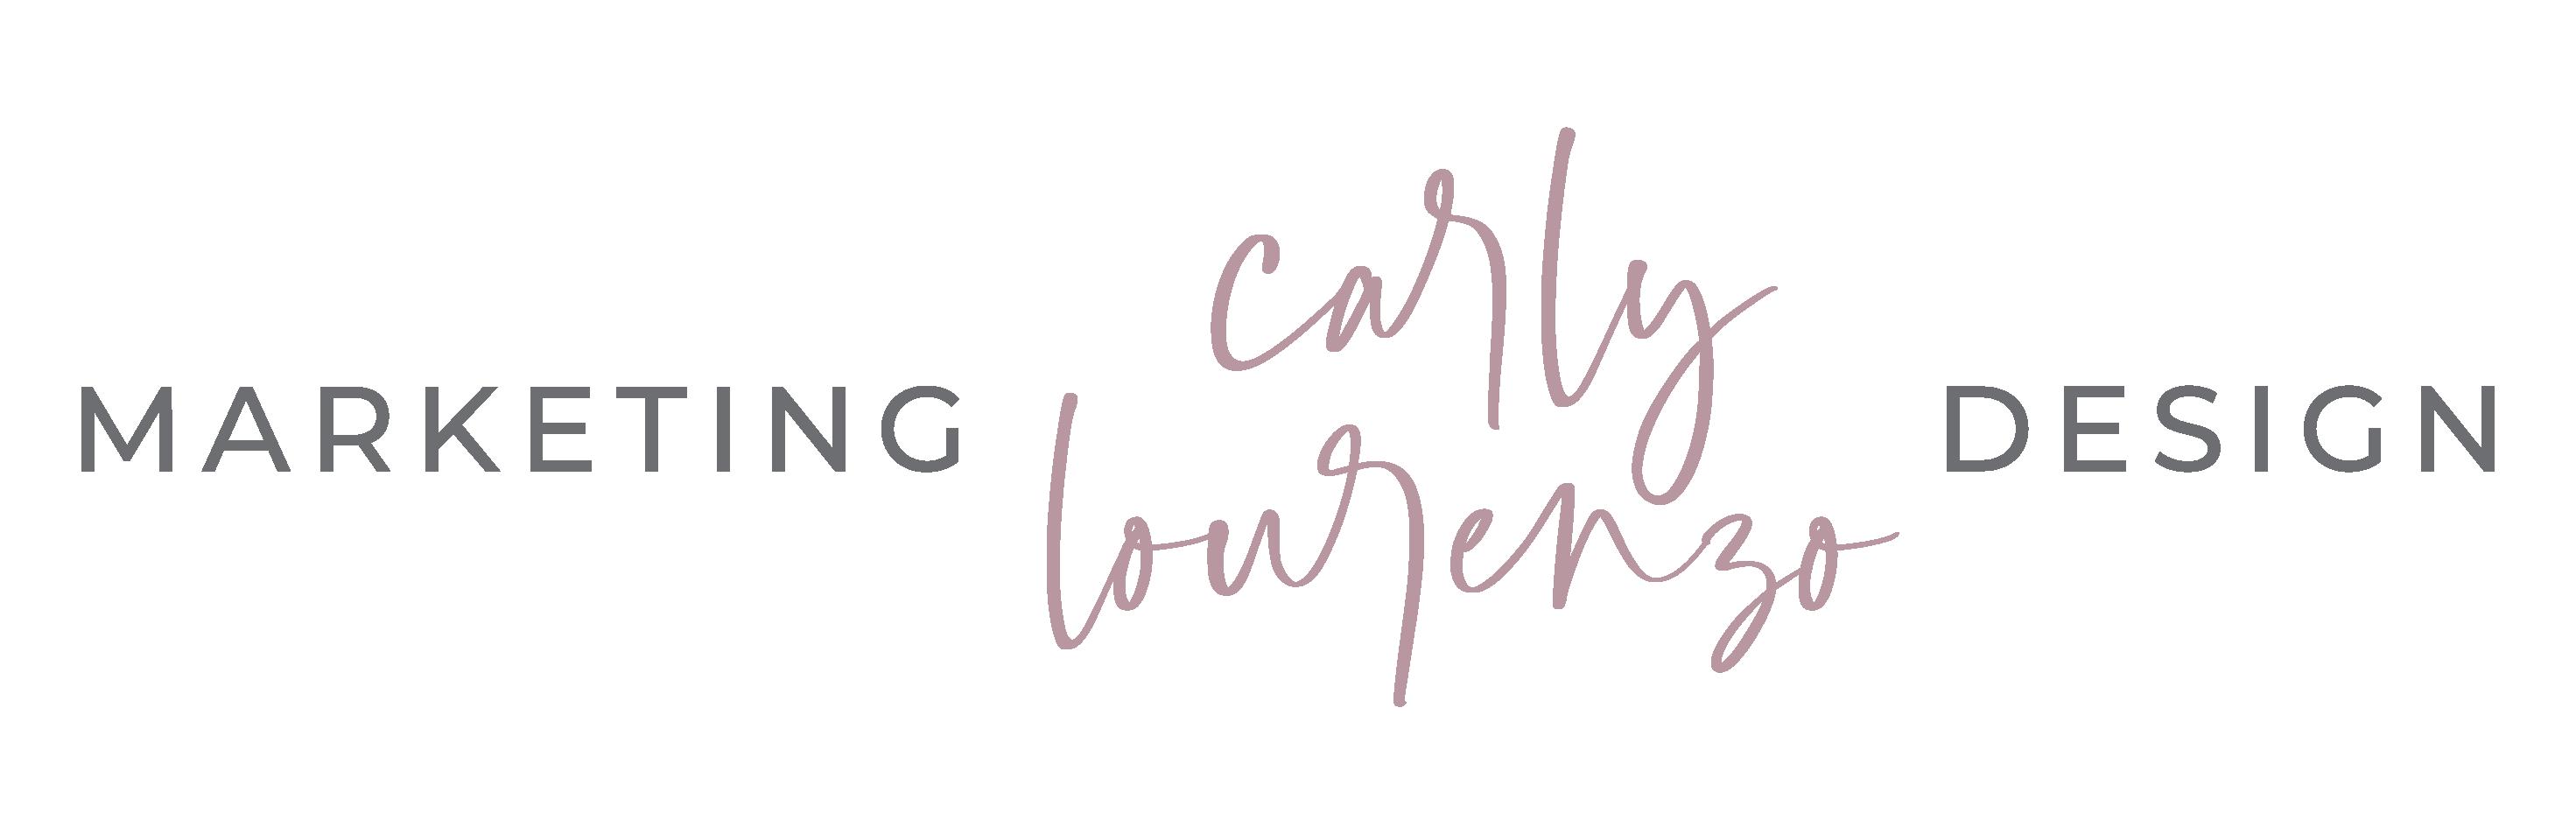 Carly Lourenzo Marketing & Design